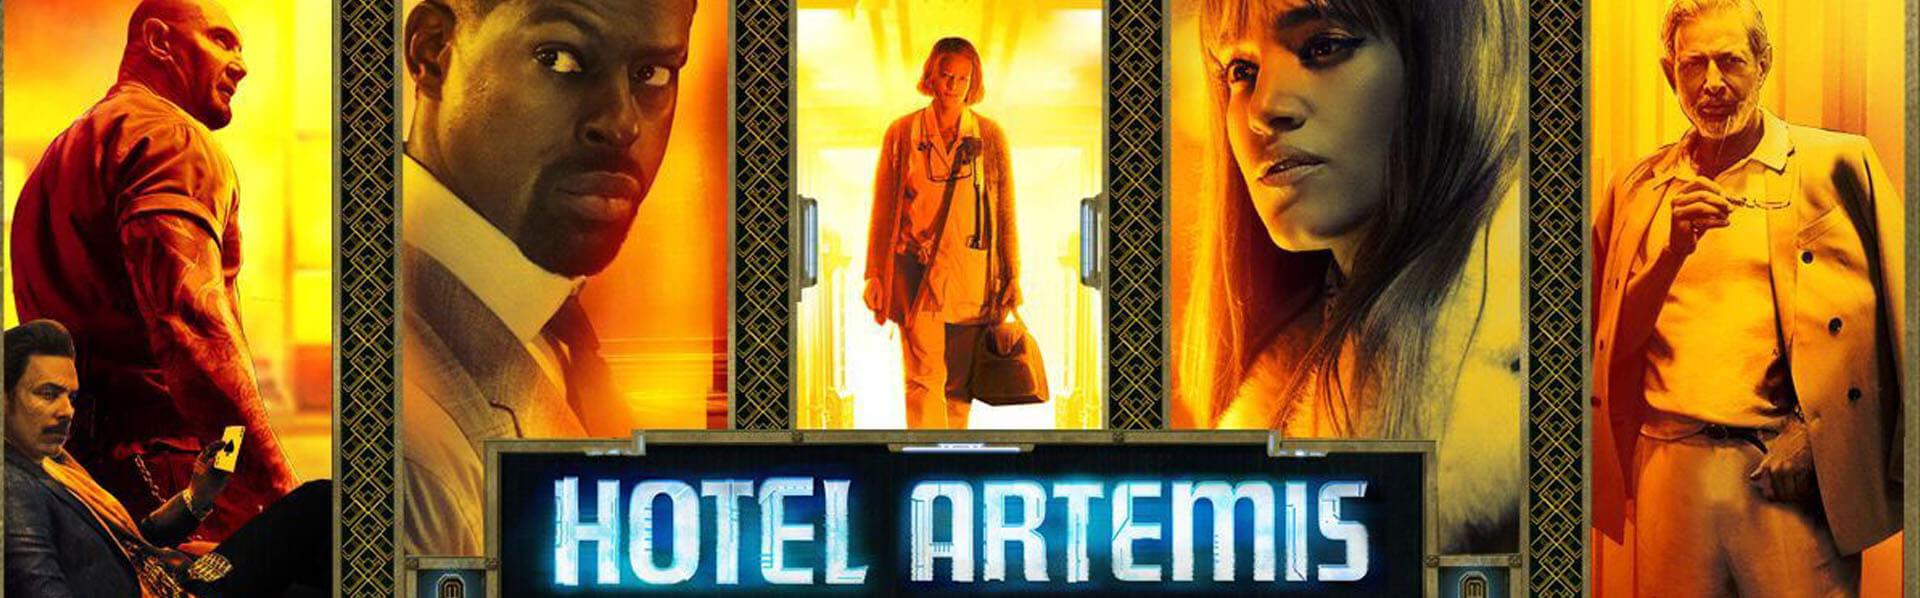 hotelbanner1